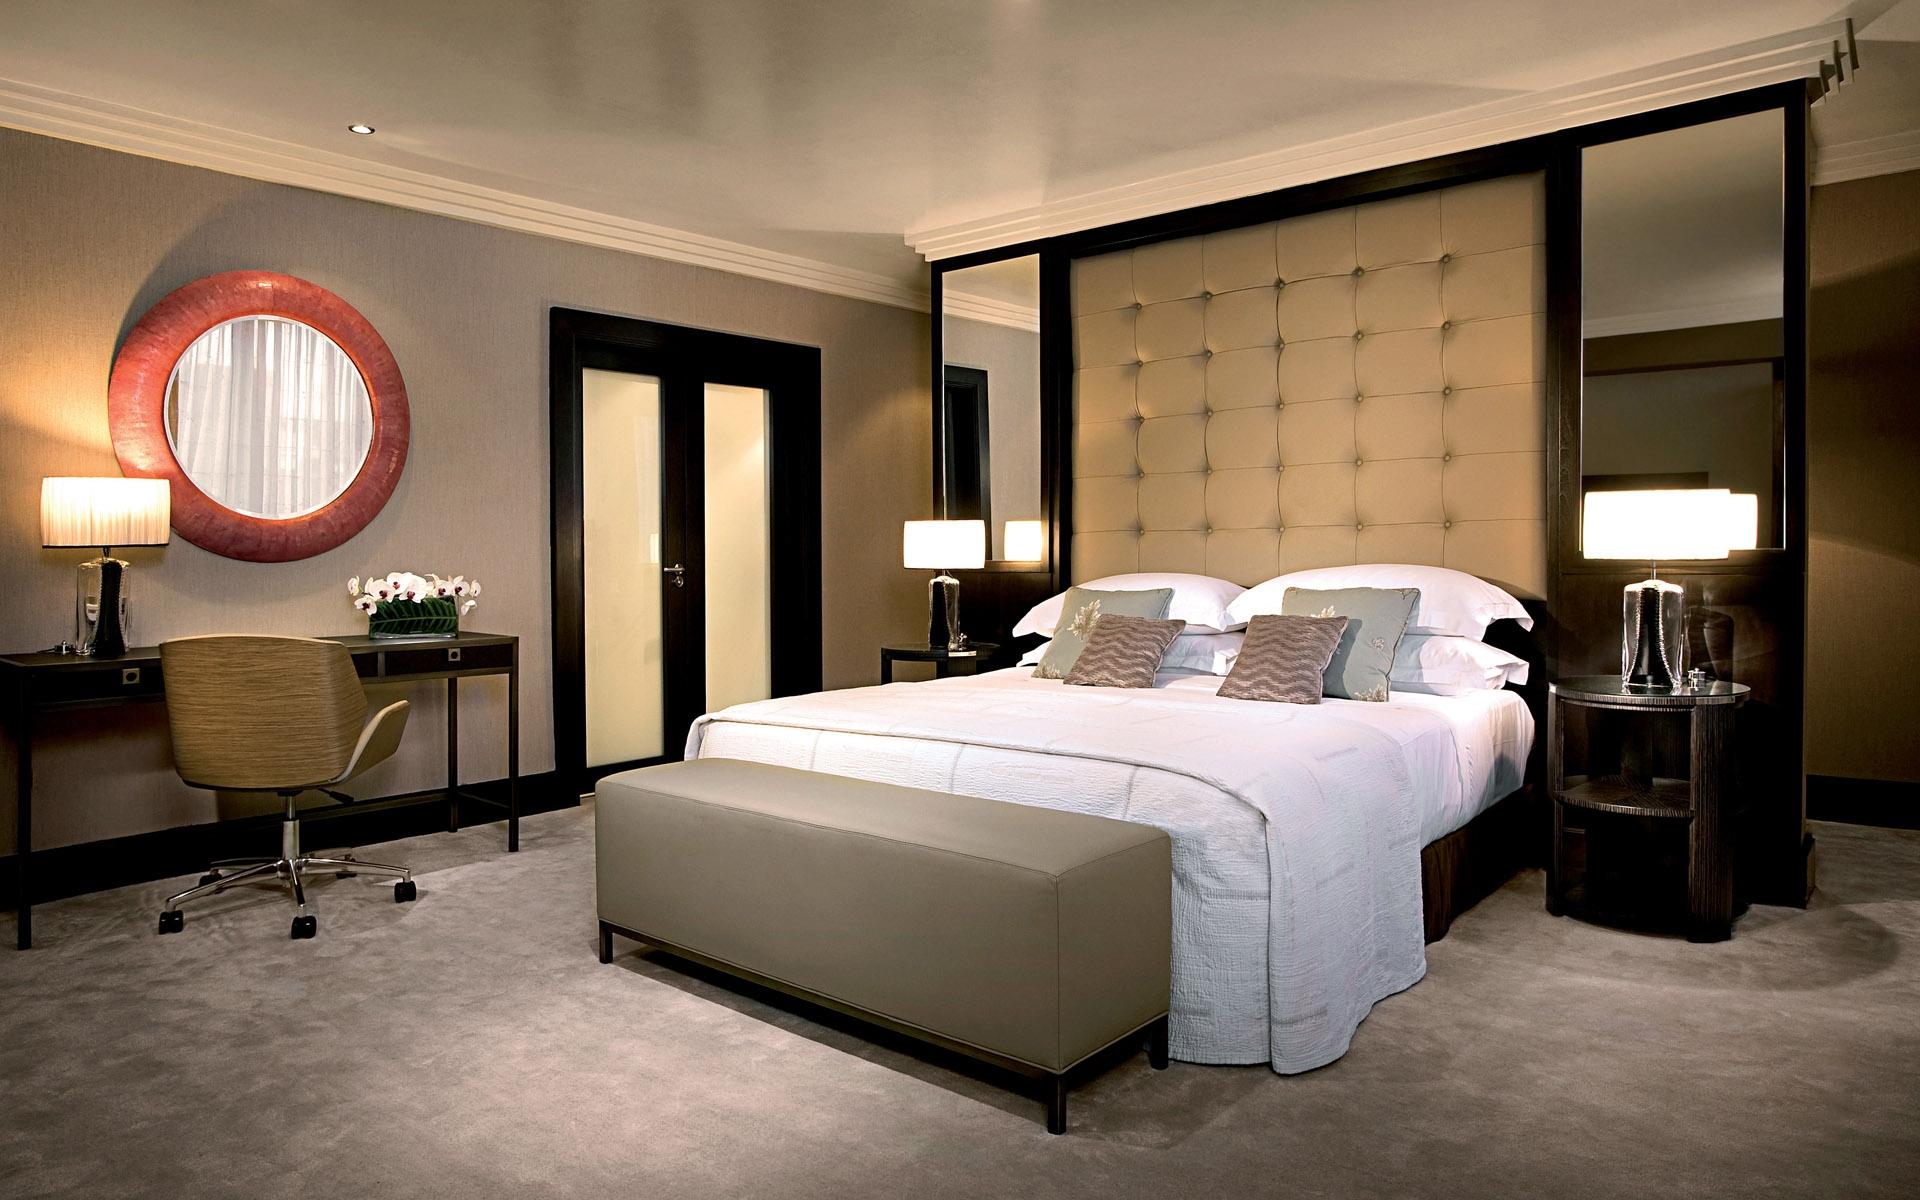 Traditional-bedroom-interior-design-5